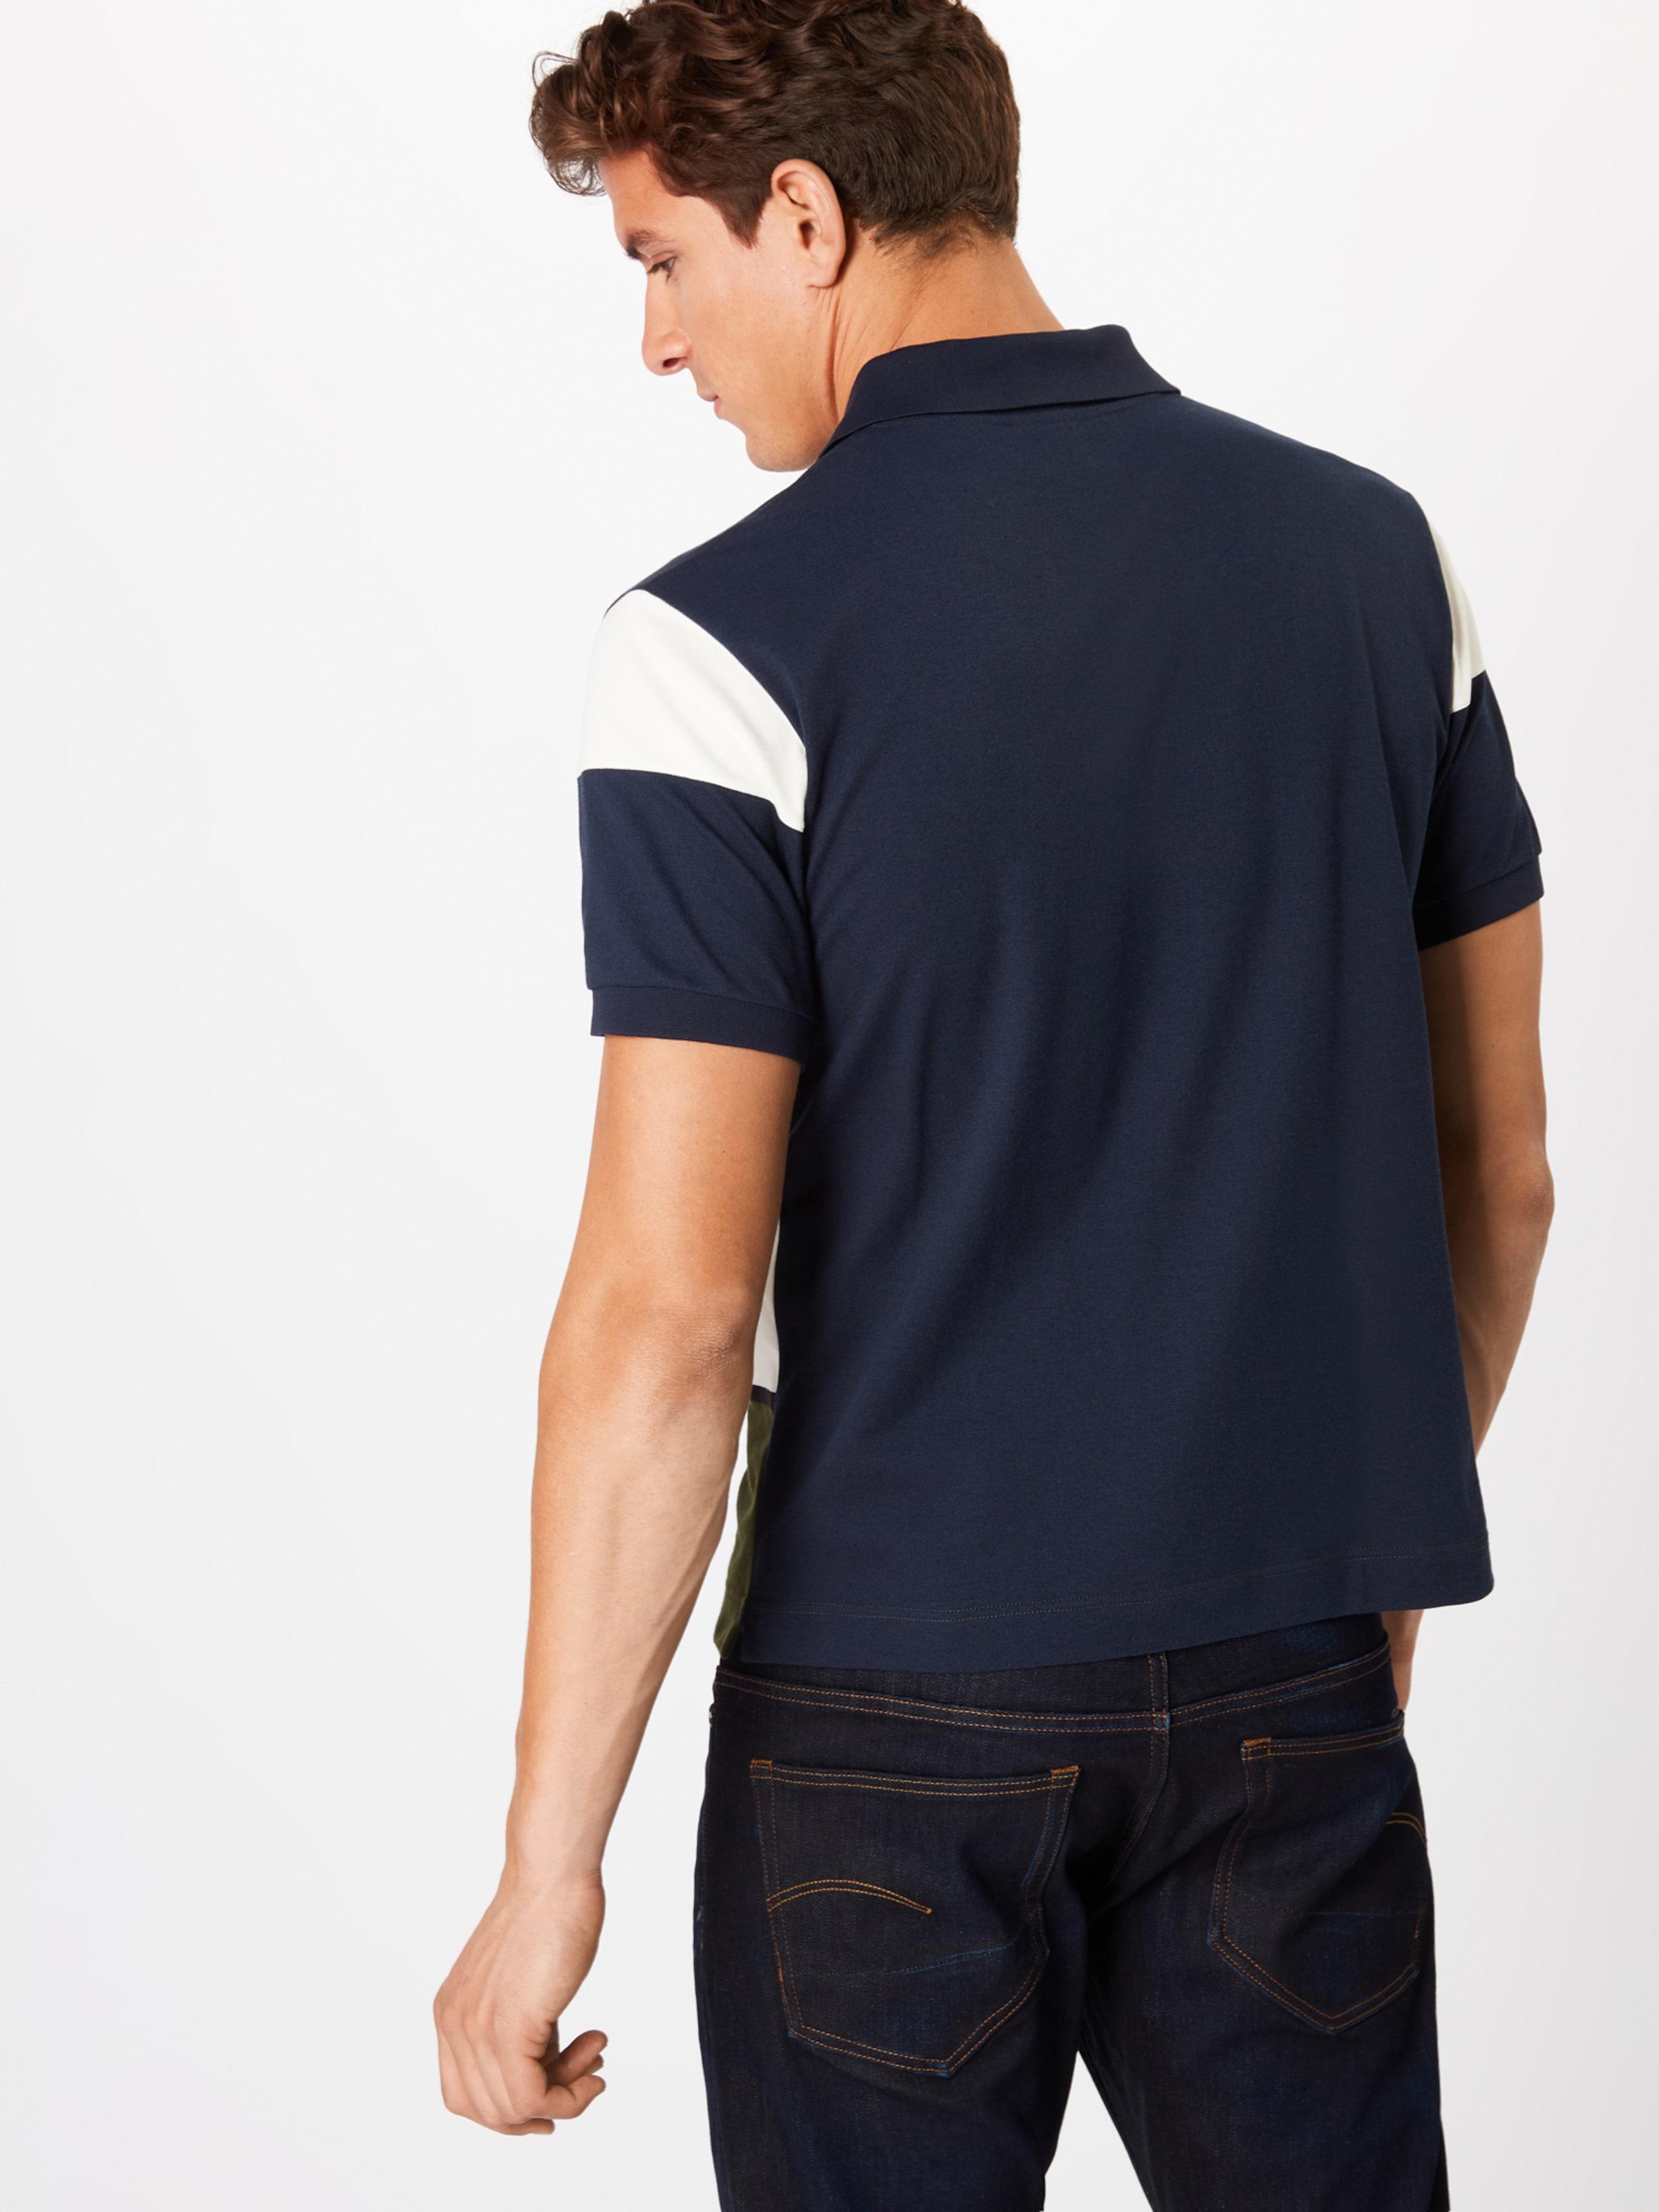 Col Ma' Lacoste In Polo cotes Bord BlauGrün Weiß 'chemise kXiuZP